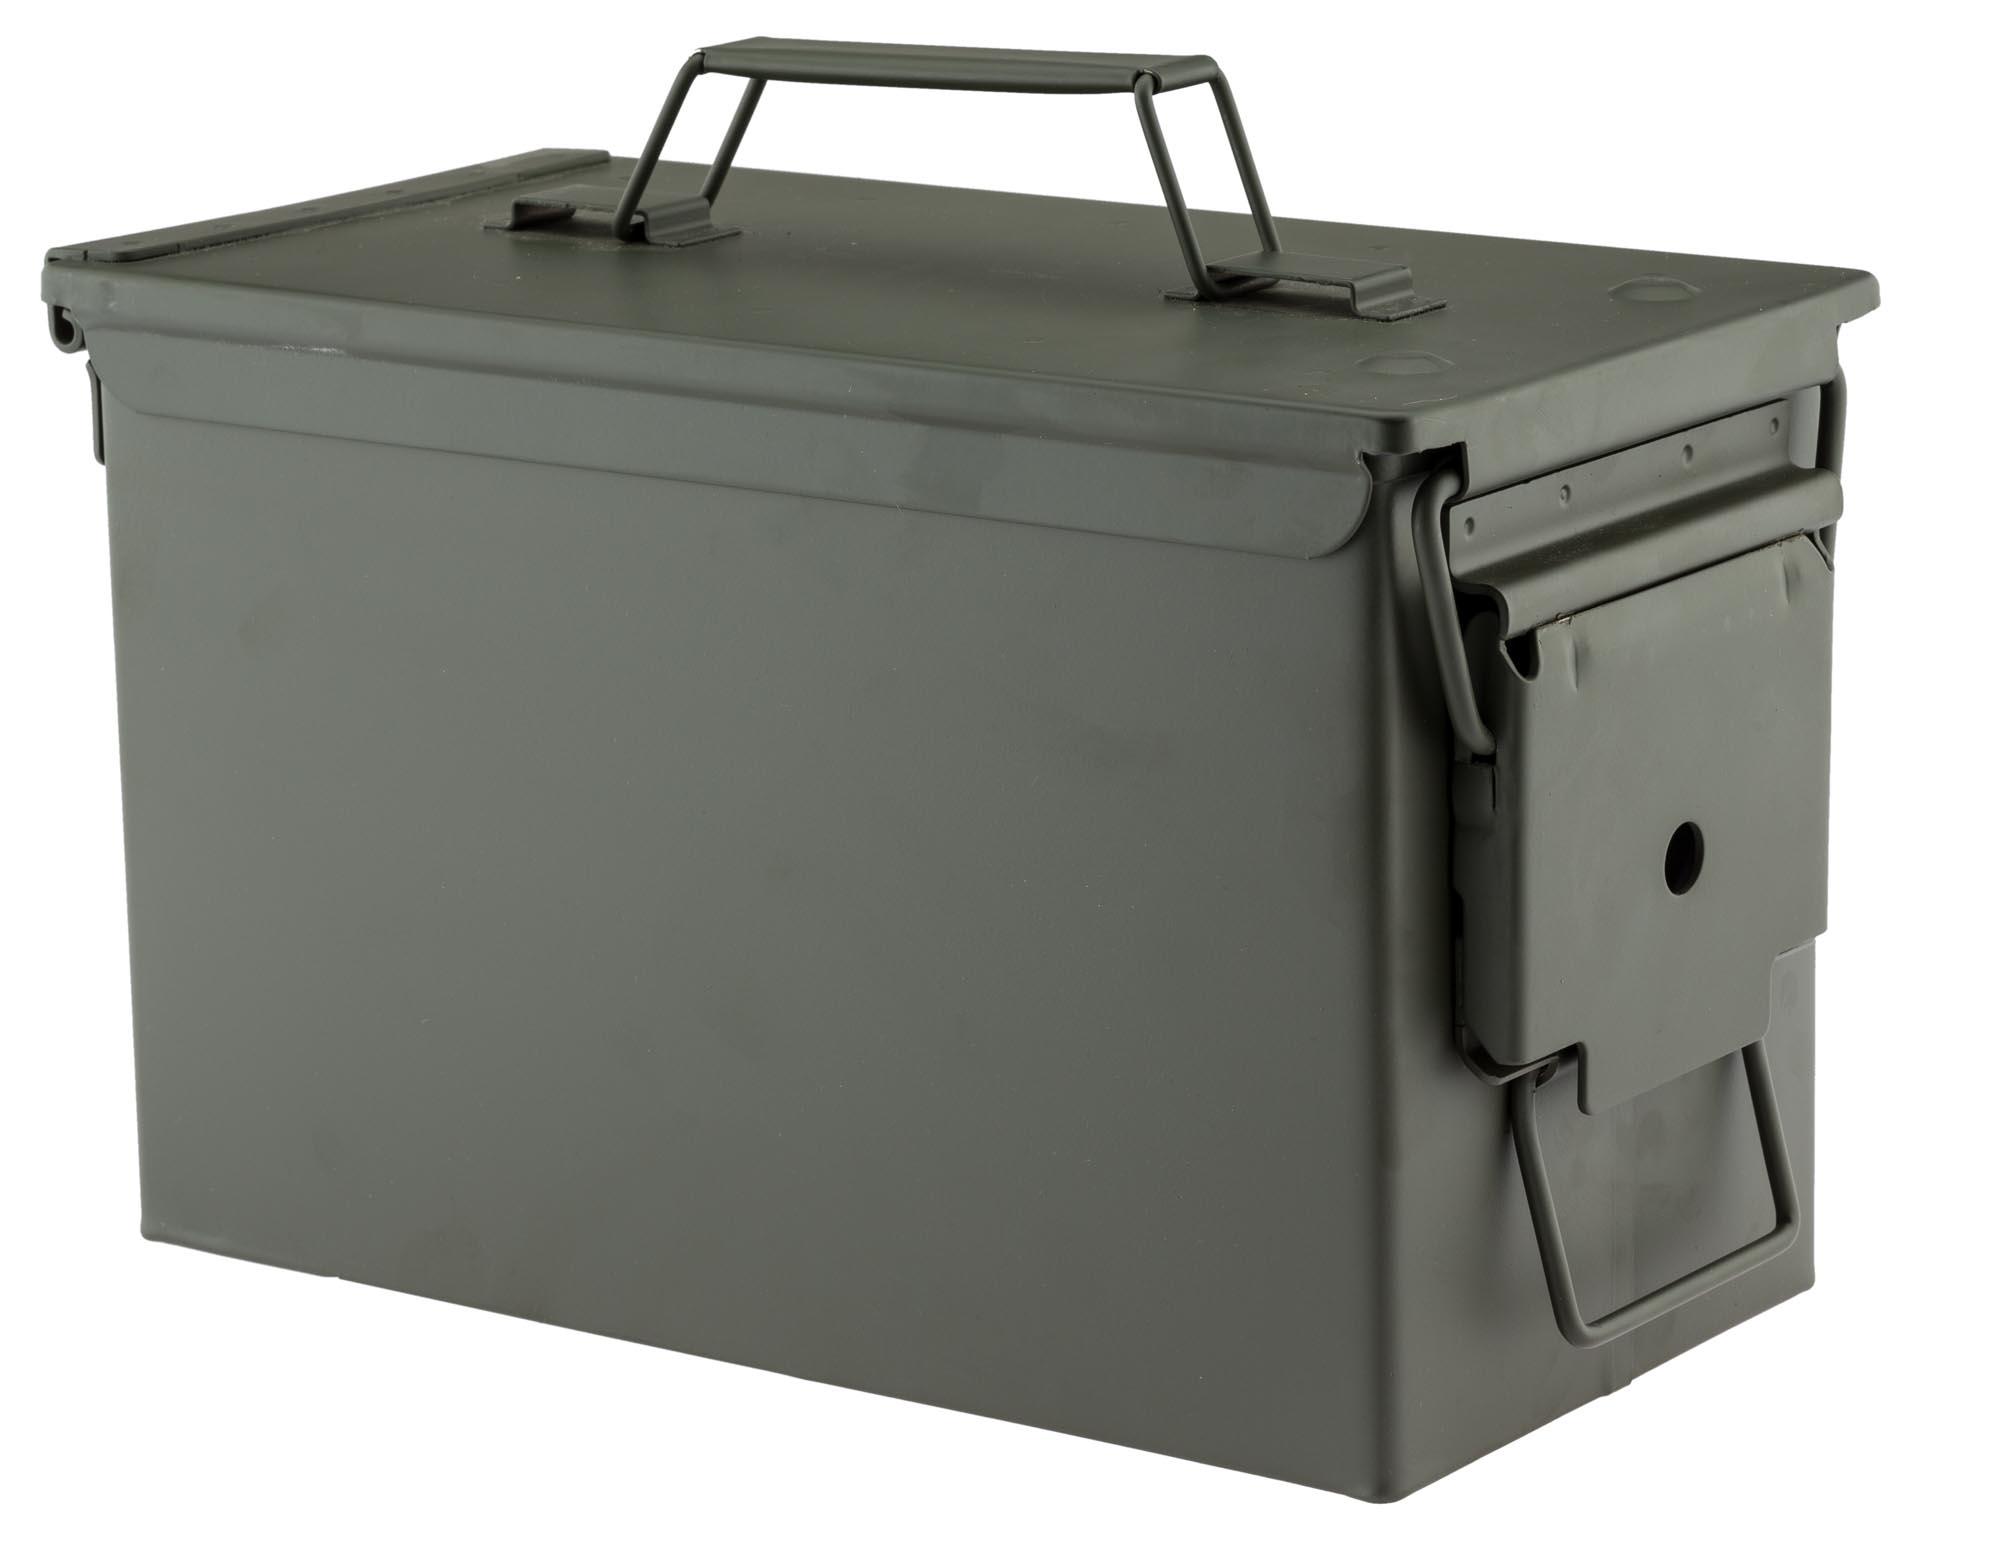 caisse munitions m tallique vide mal1000 droneshop. Black Bedroom Furniture Sets. Home Design Ideas